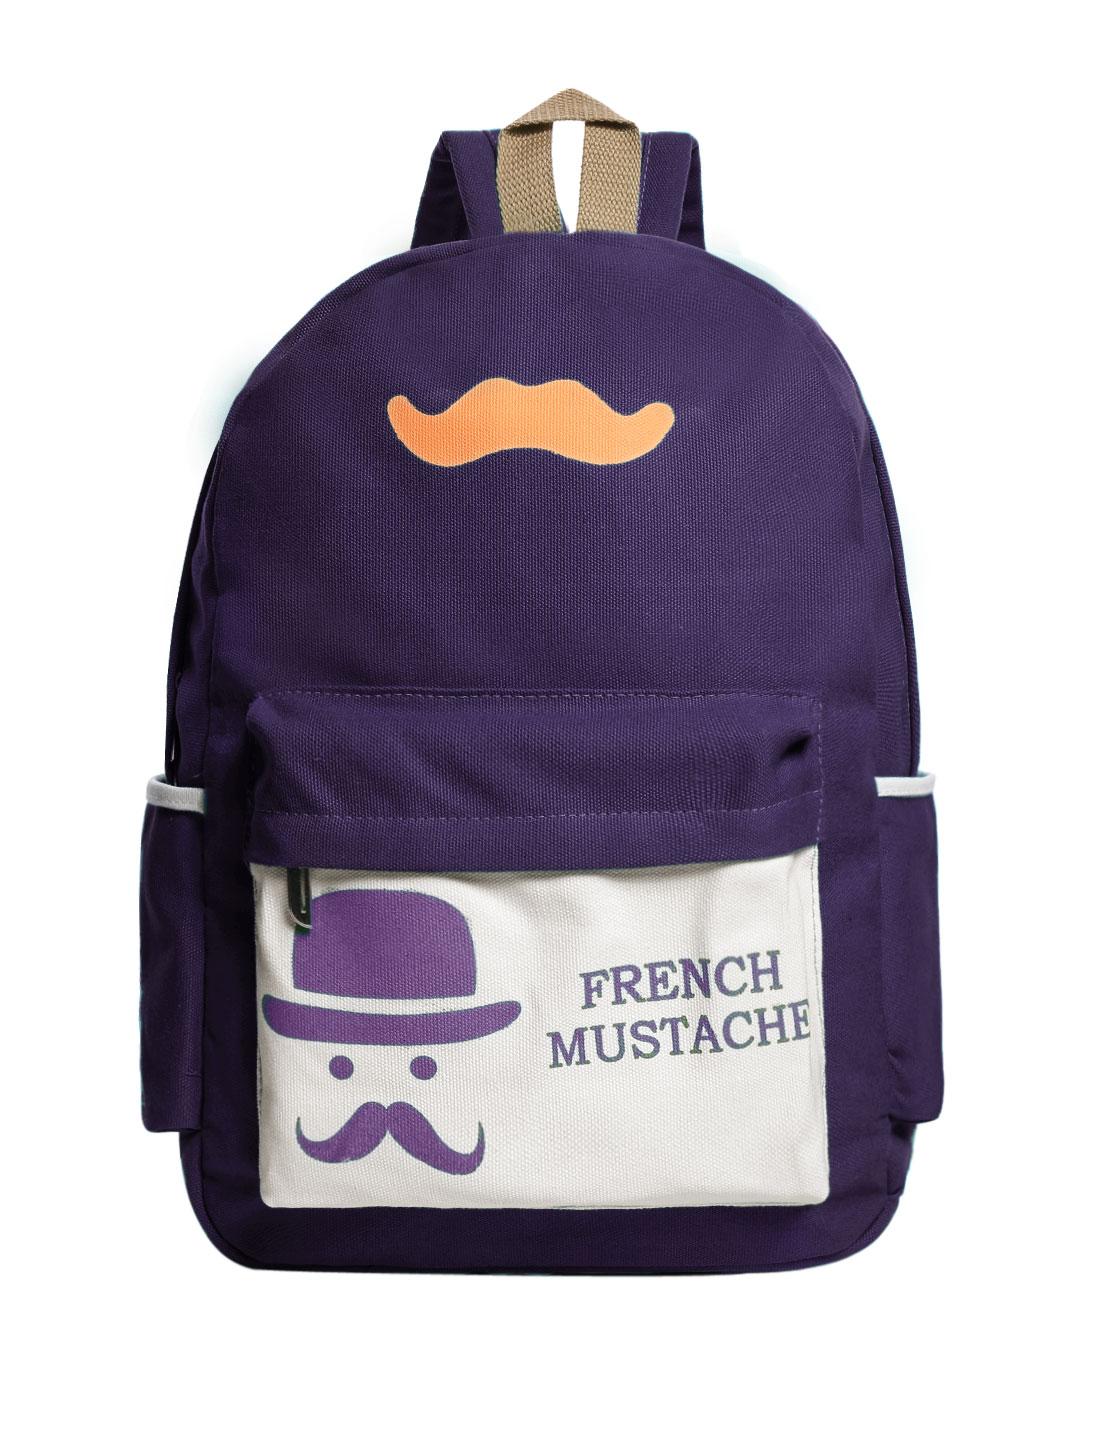 Fashion Women Canvas Backpack School Bag Travel Rucksack Bookbag Purple